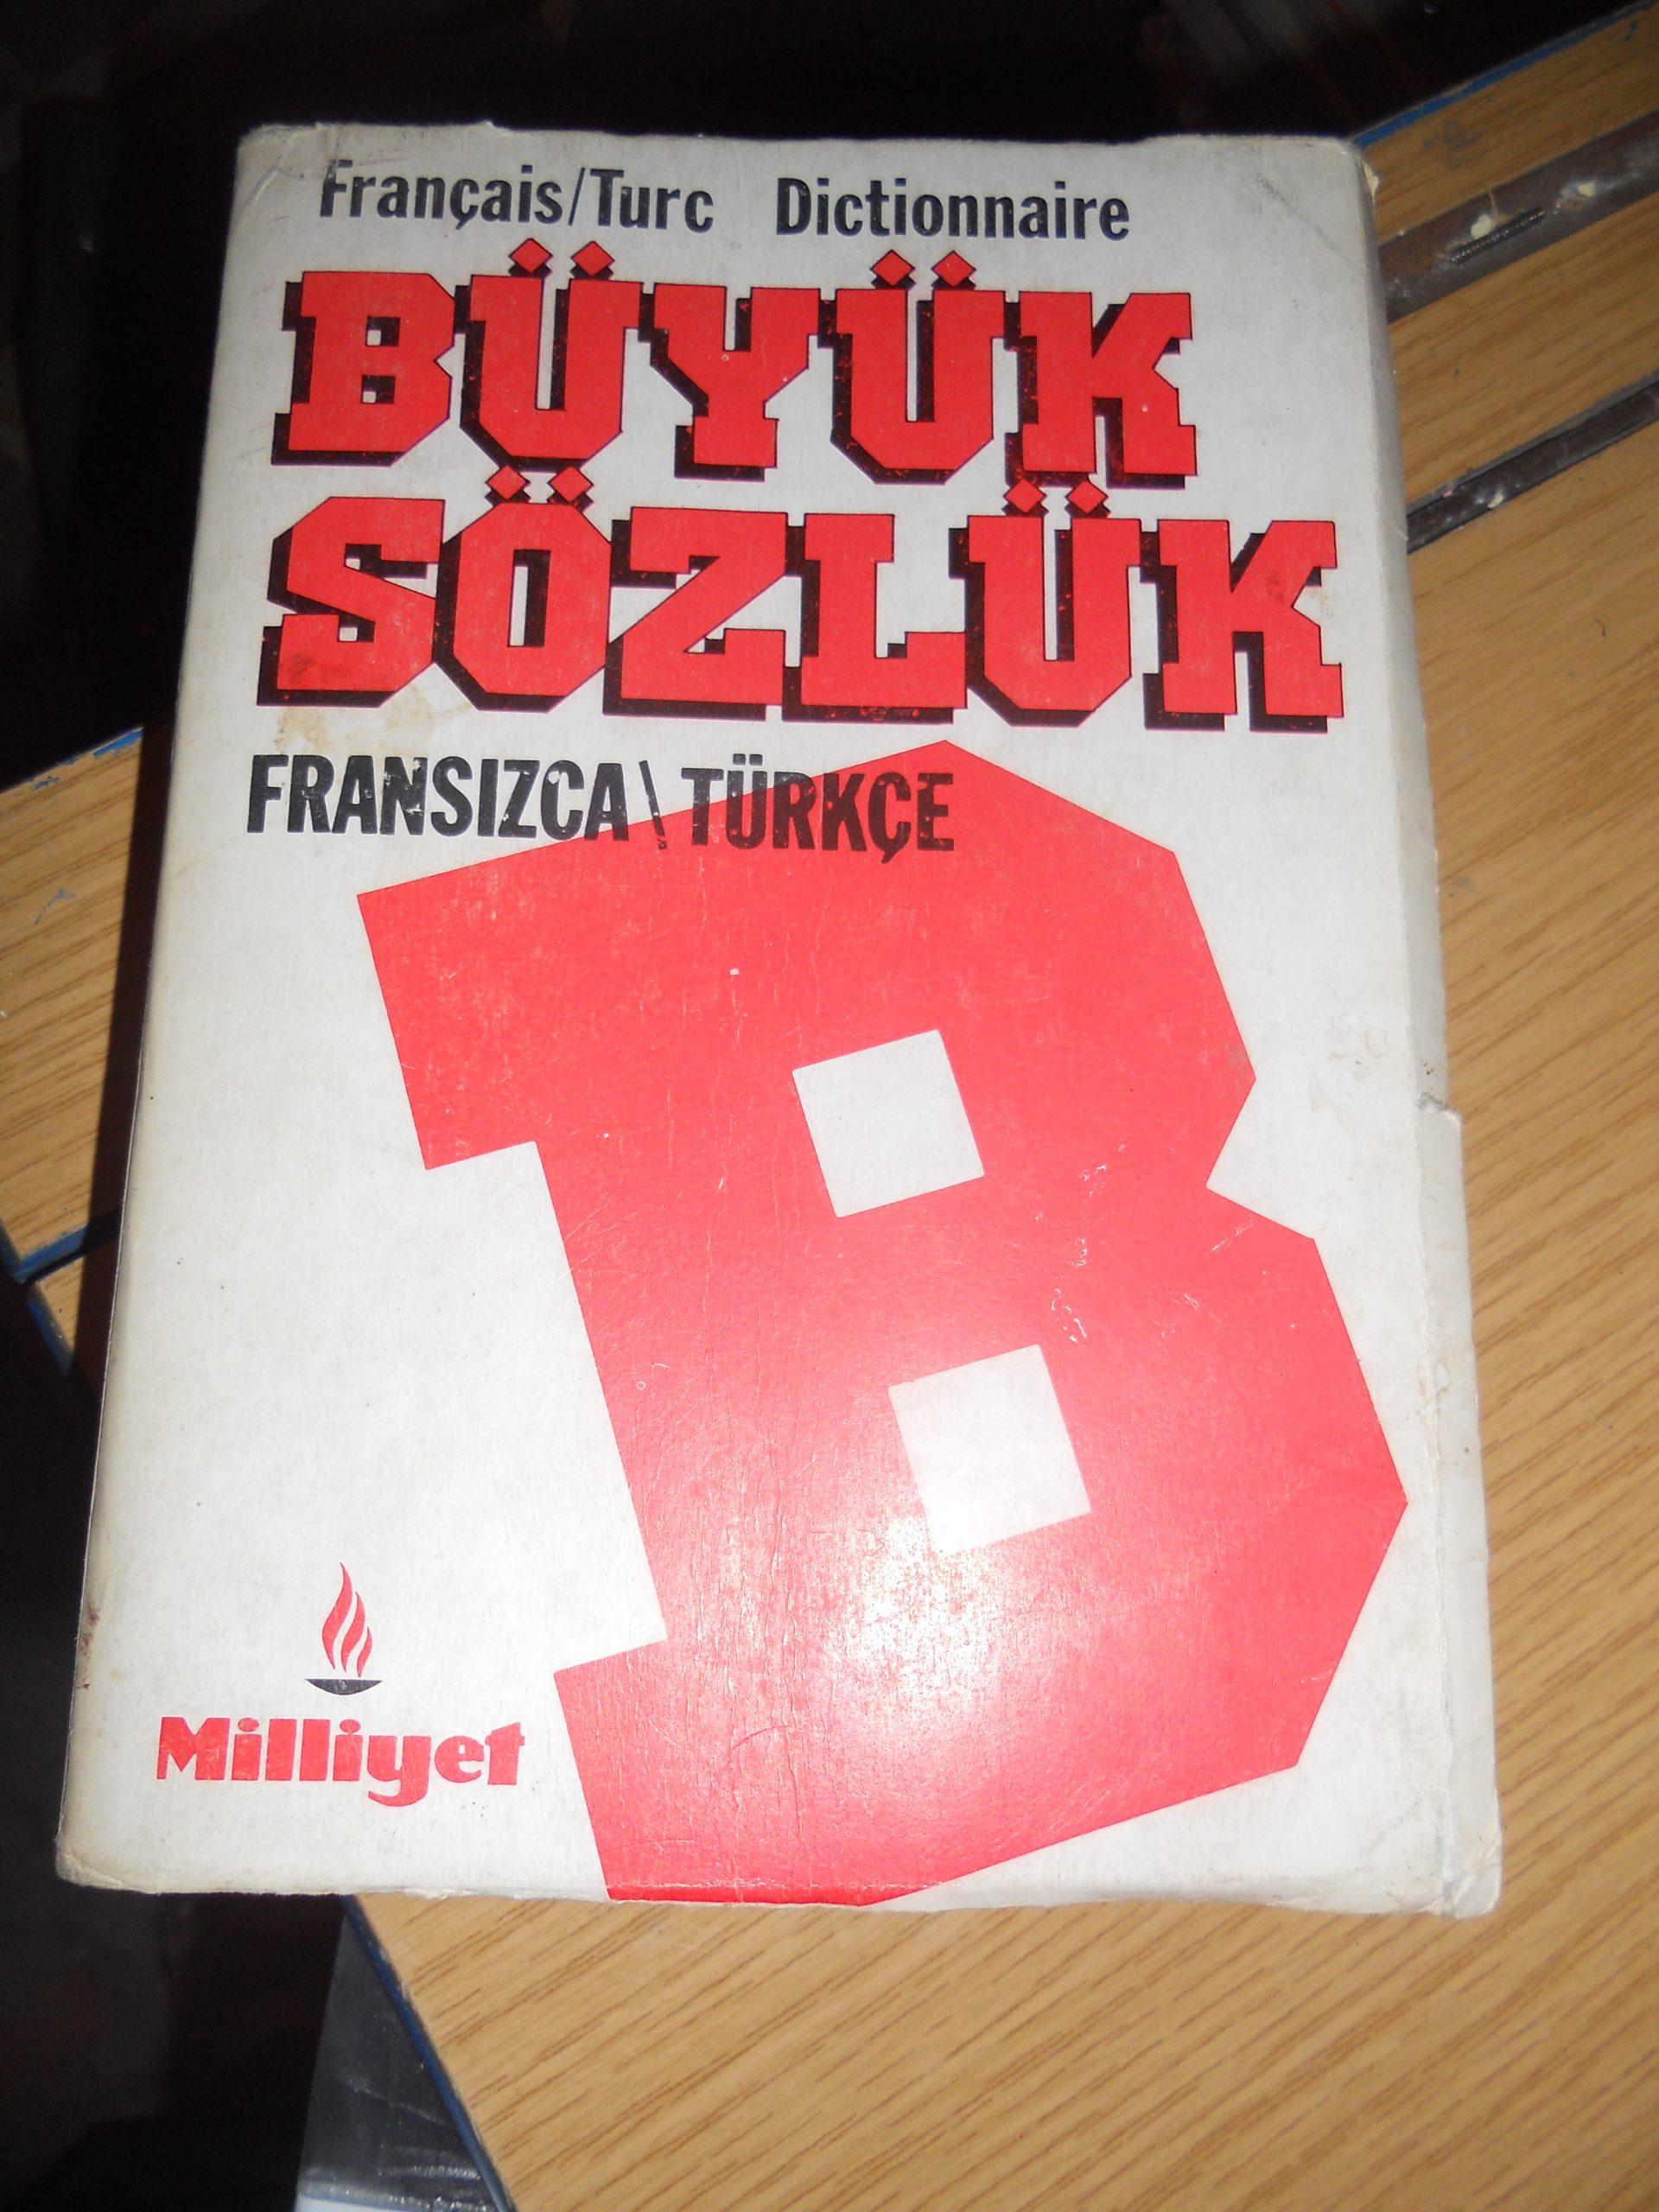 Büyük sözlük(Fransızca-Türkçe)/Milliyet/10 tl